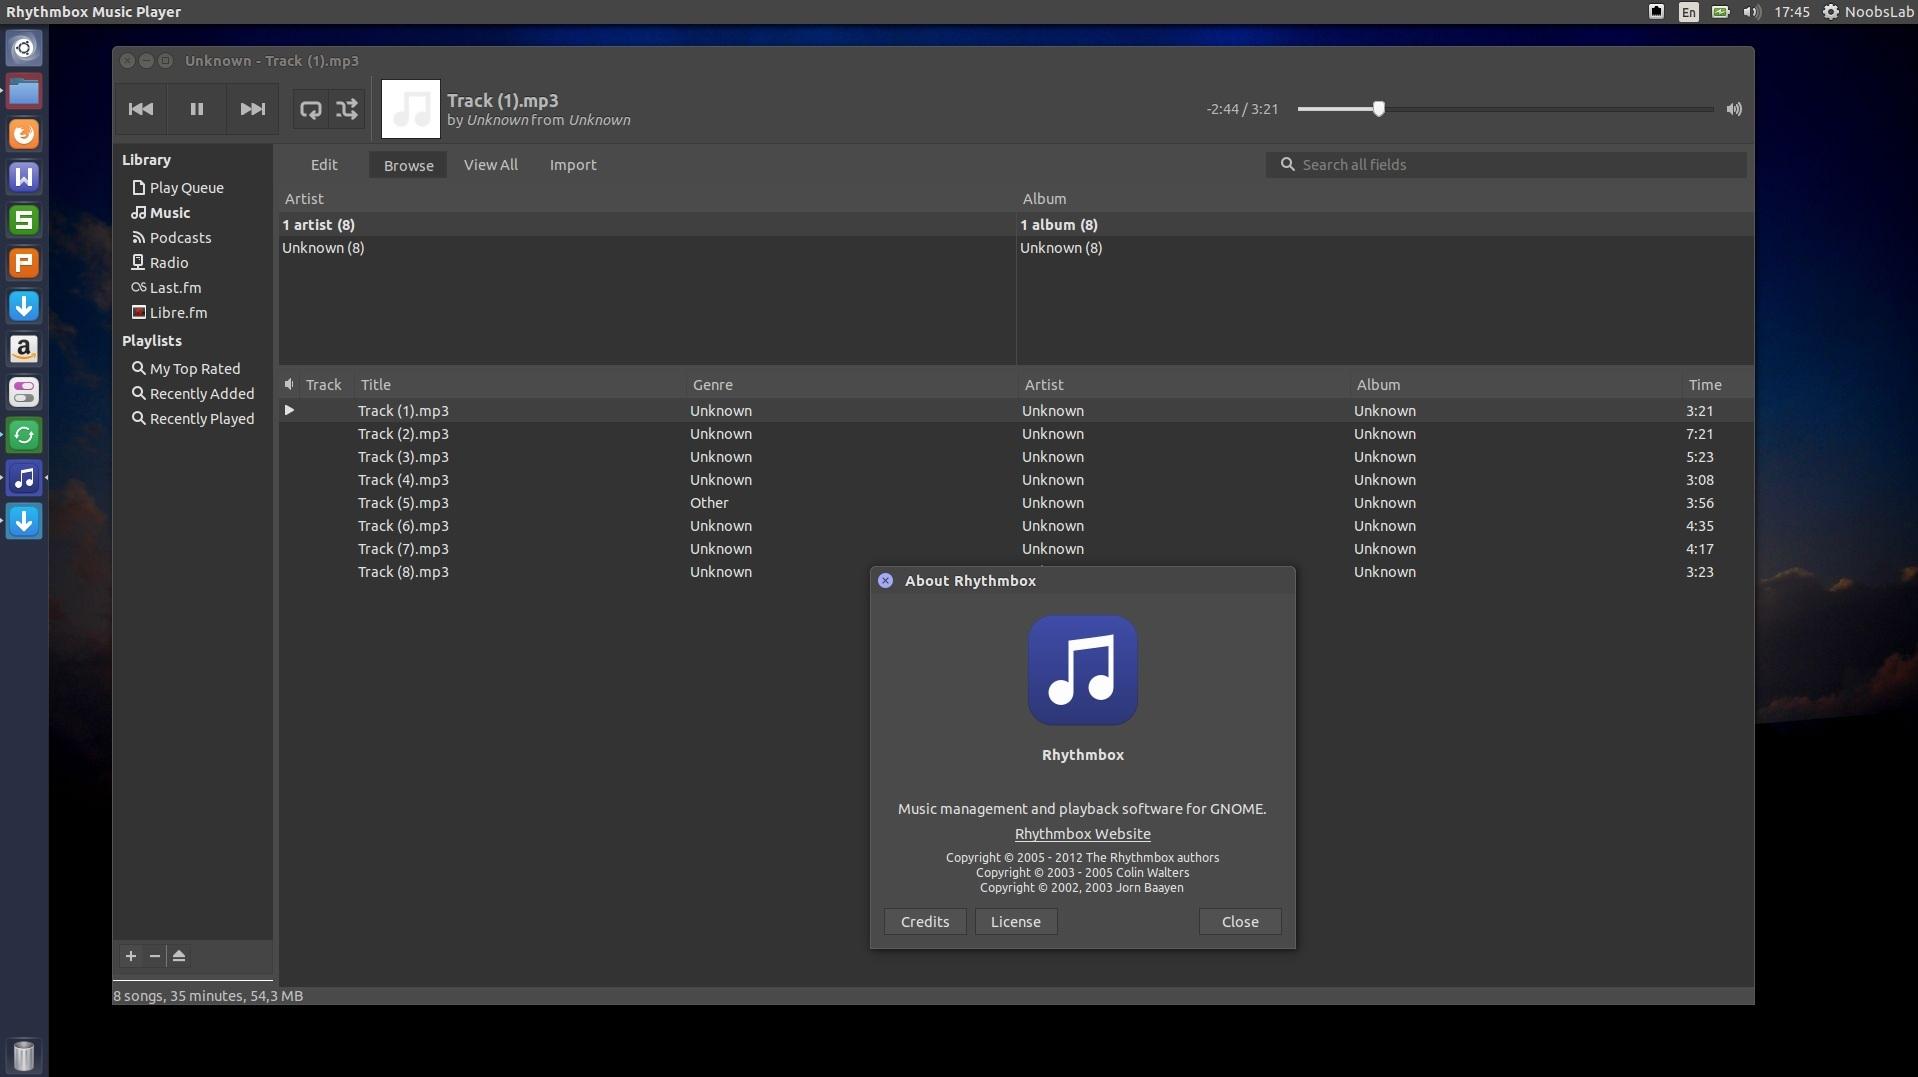 Rhythmbox 3 3 With Lots of Plugins For Ubuntu/Linux Mint